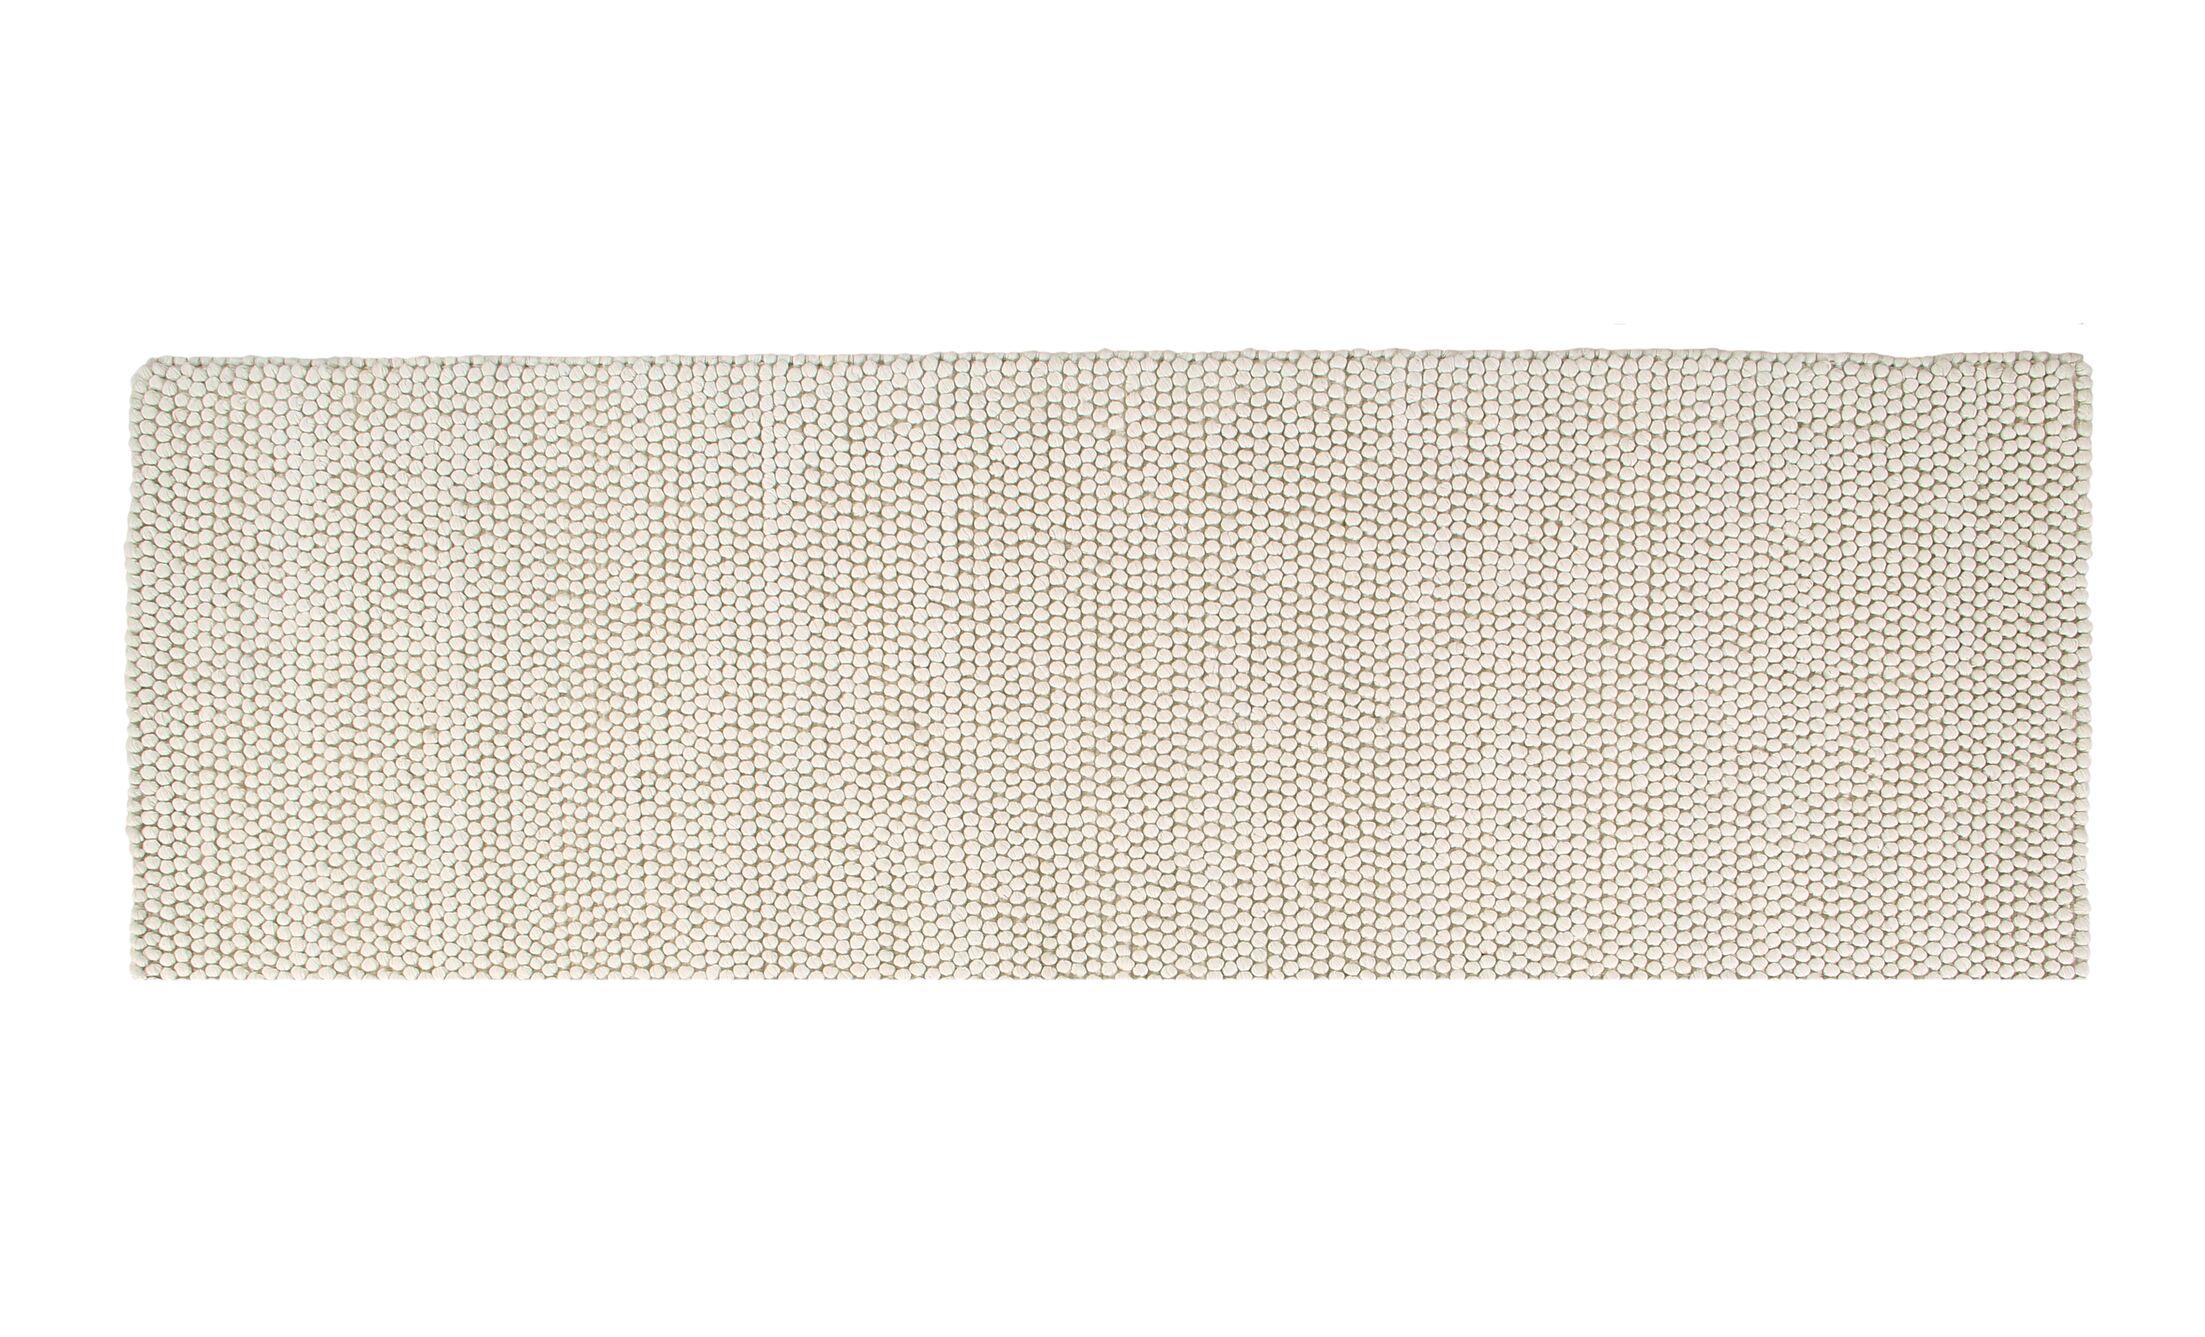 Boston Hand-Woven Wool White Area Rug Rug Size: Runner 2' x 6'